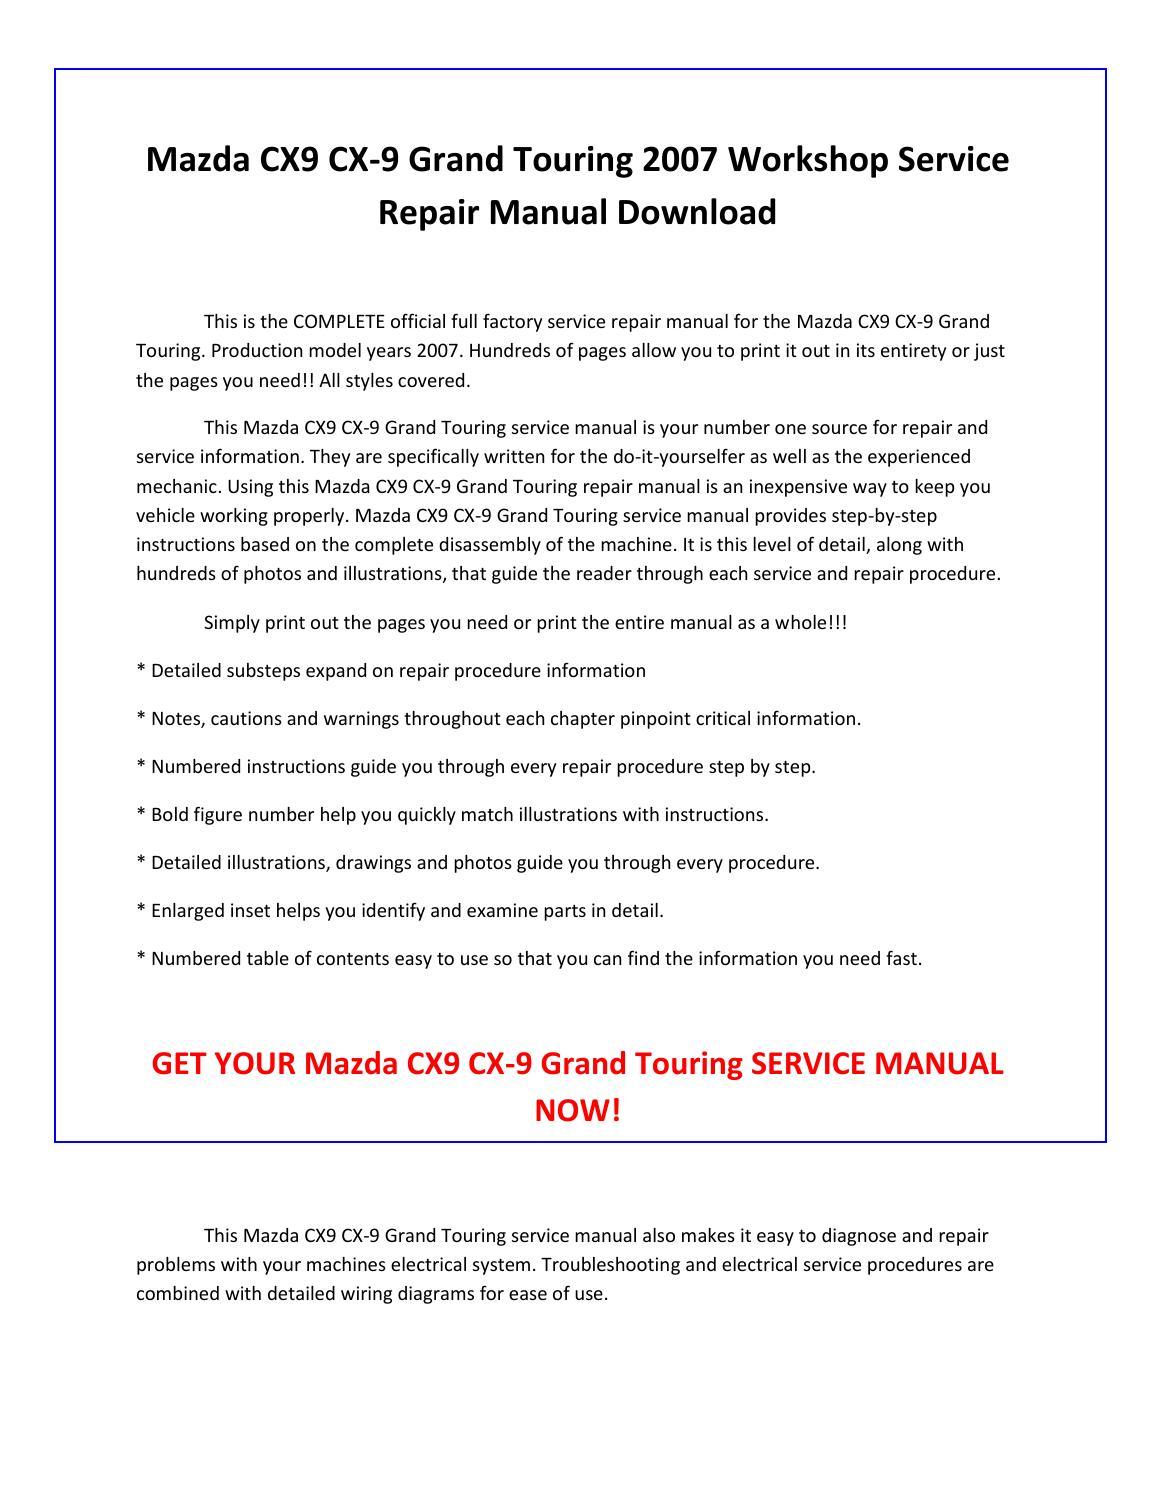 mazda cx9 cx 9 grand touring 2007 service repair manual. Black Bedroom Furniture Sets. Home Design Ideas